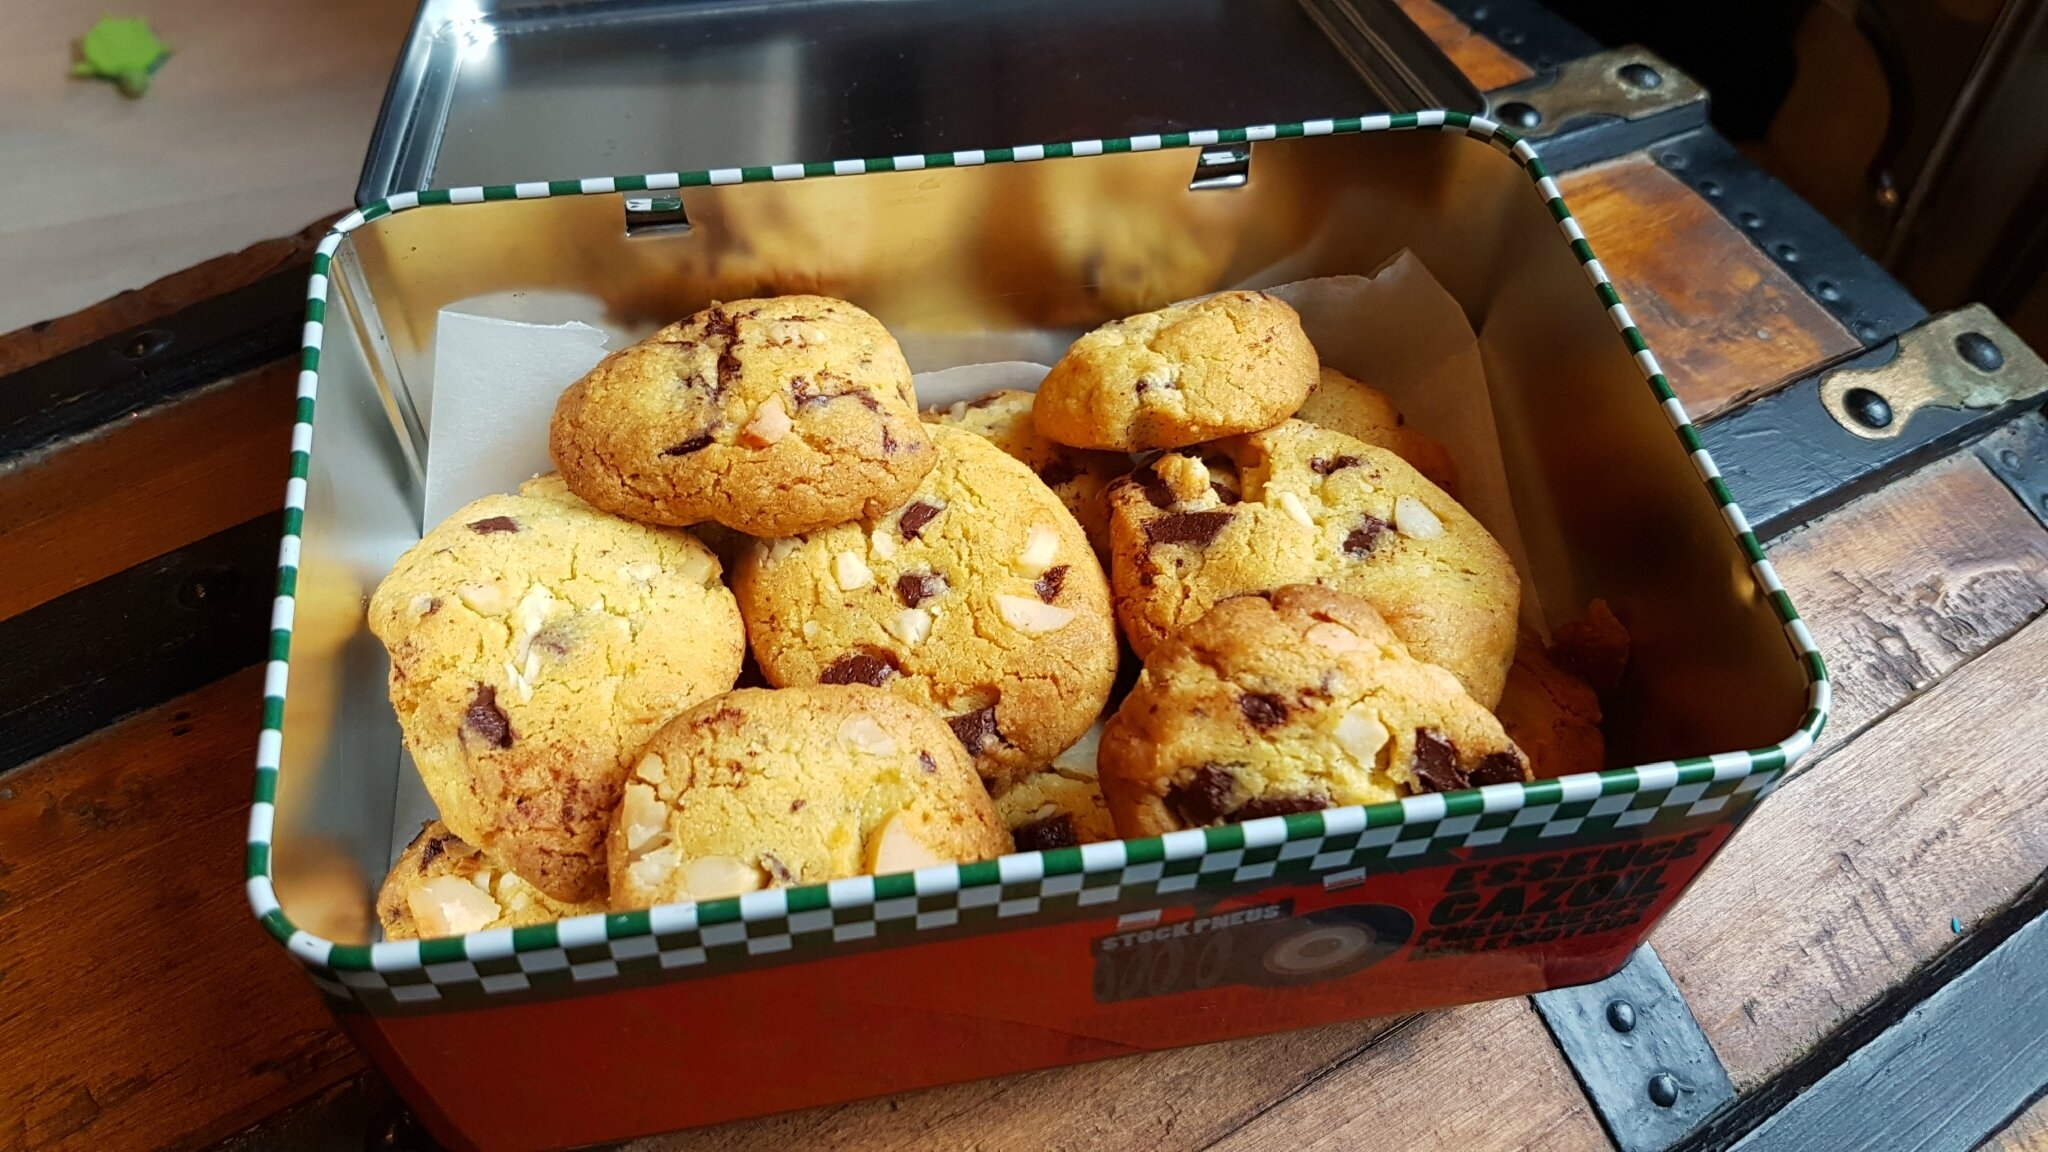 Sablookies au chocolat noir et noix de macadamia